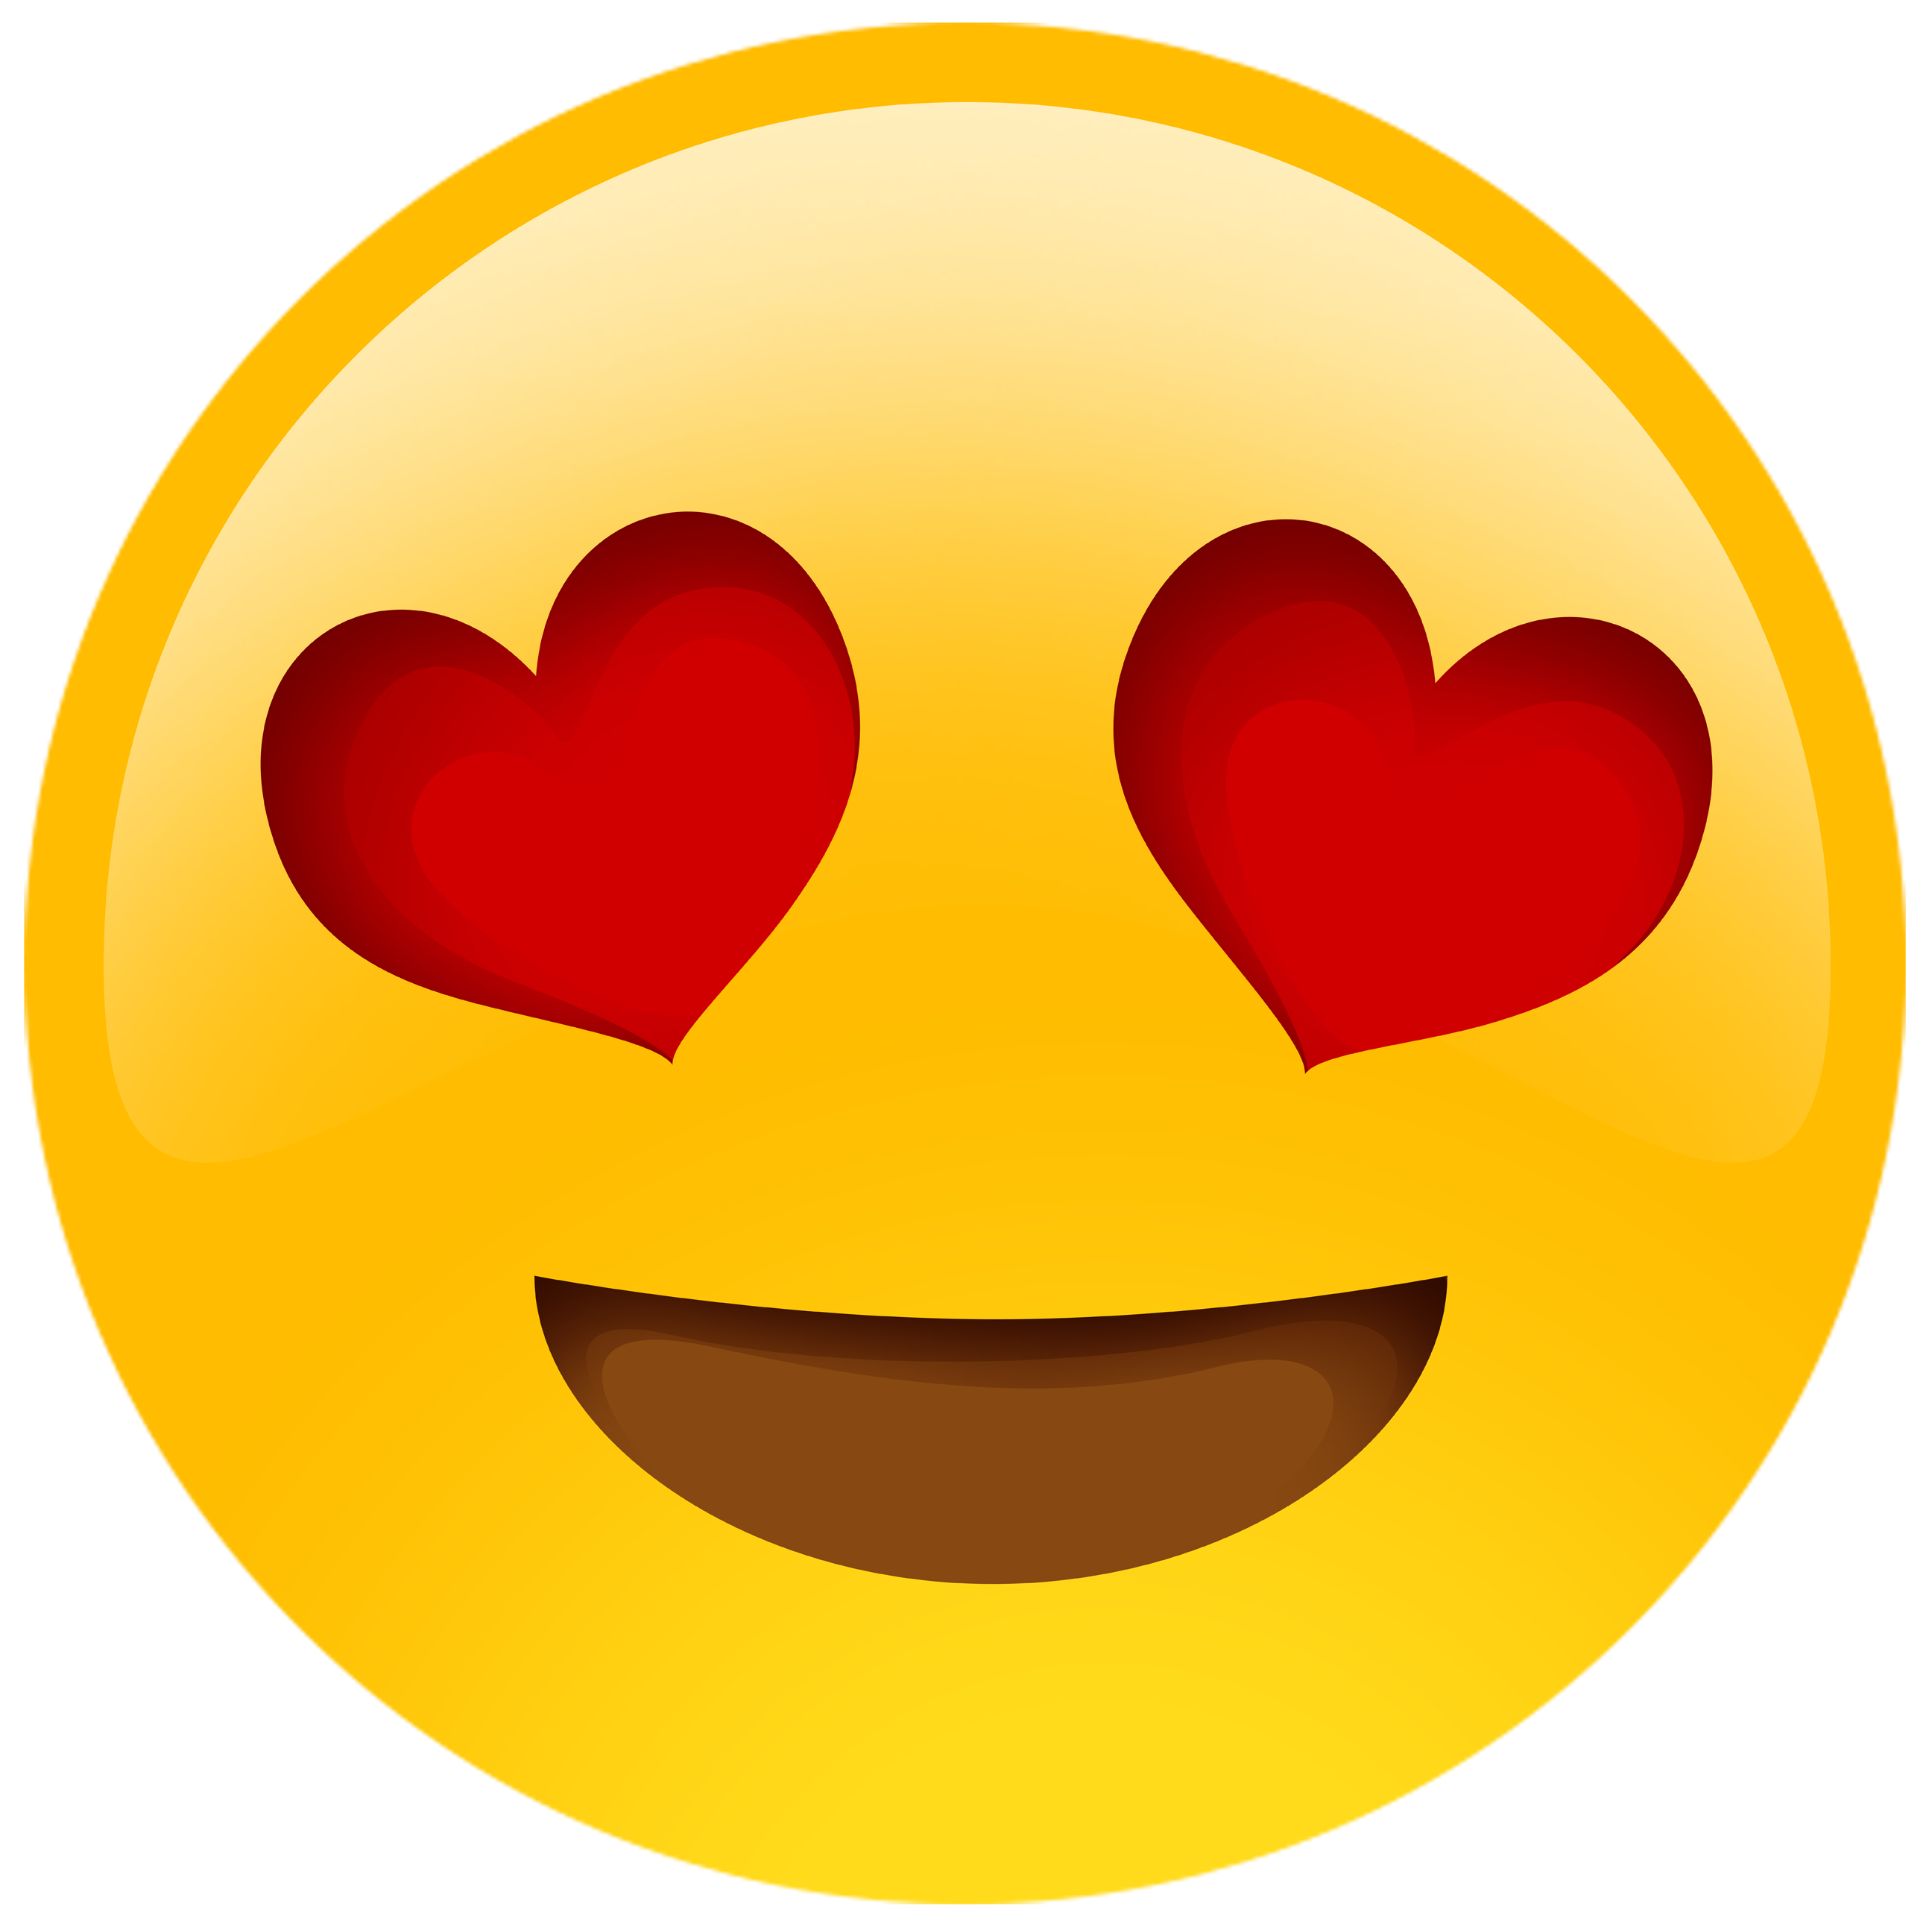 Emoji whatsapp clipart graphic free download Pin by Qundeel on Fatima 1 | Emoji clipart, Eyes emoji, Emoji mask graphic free download